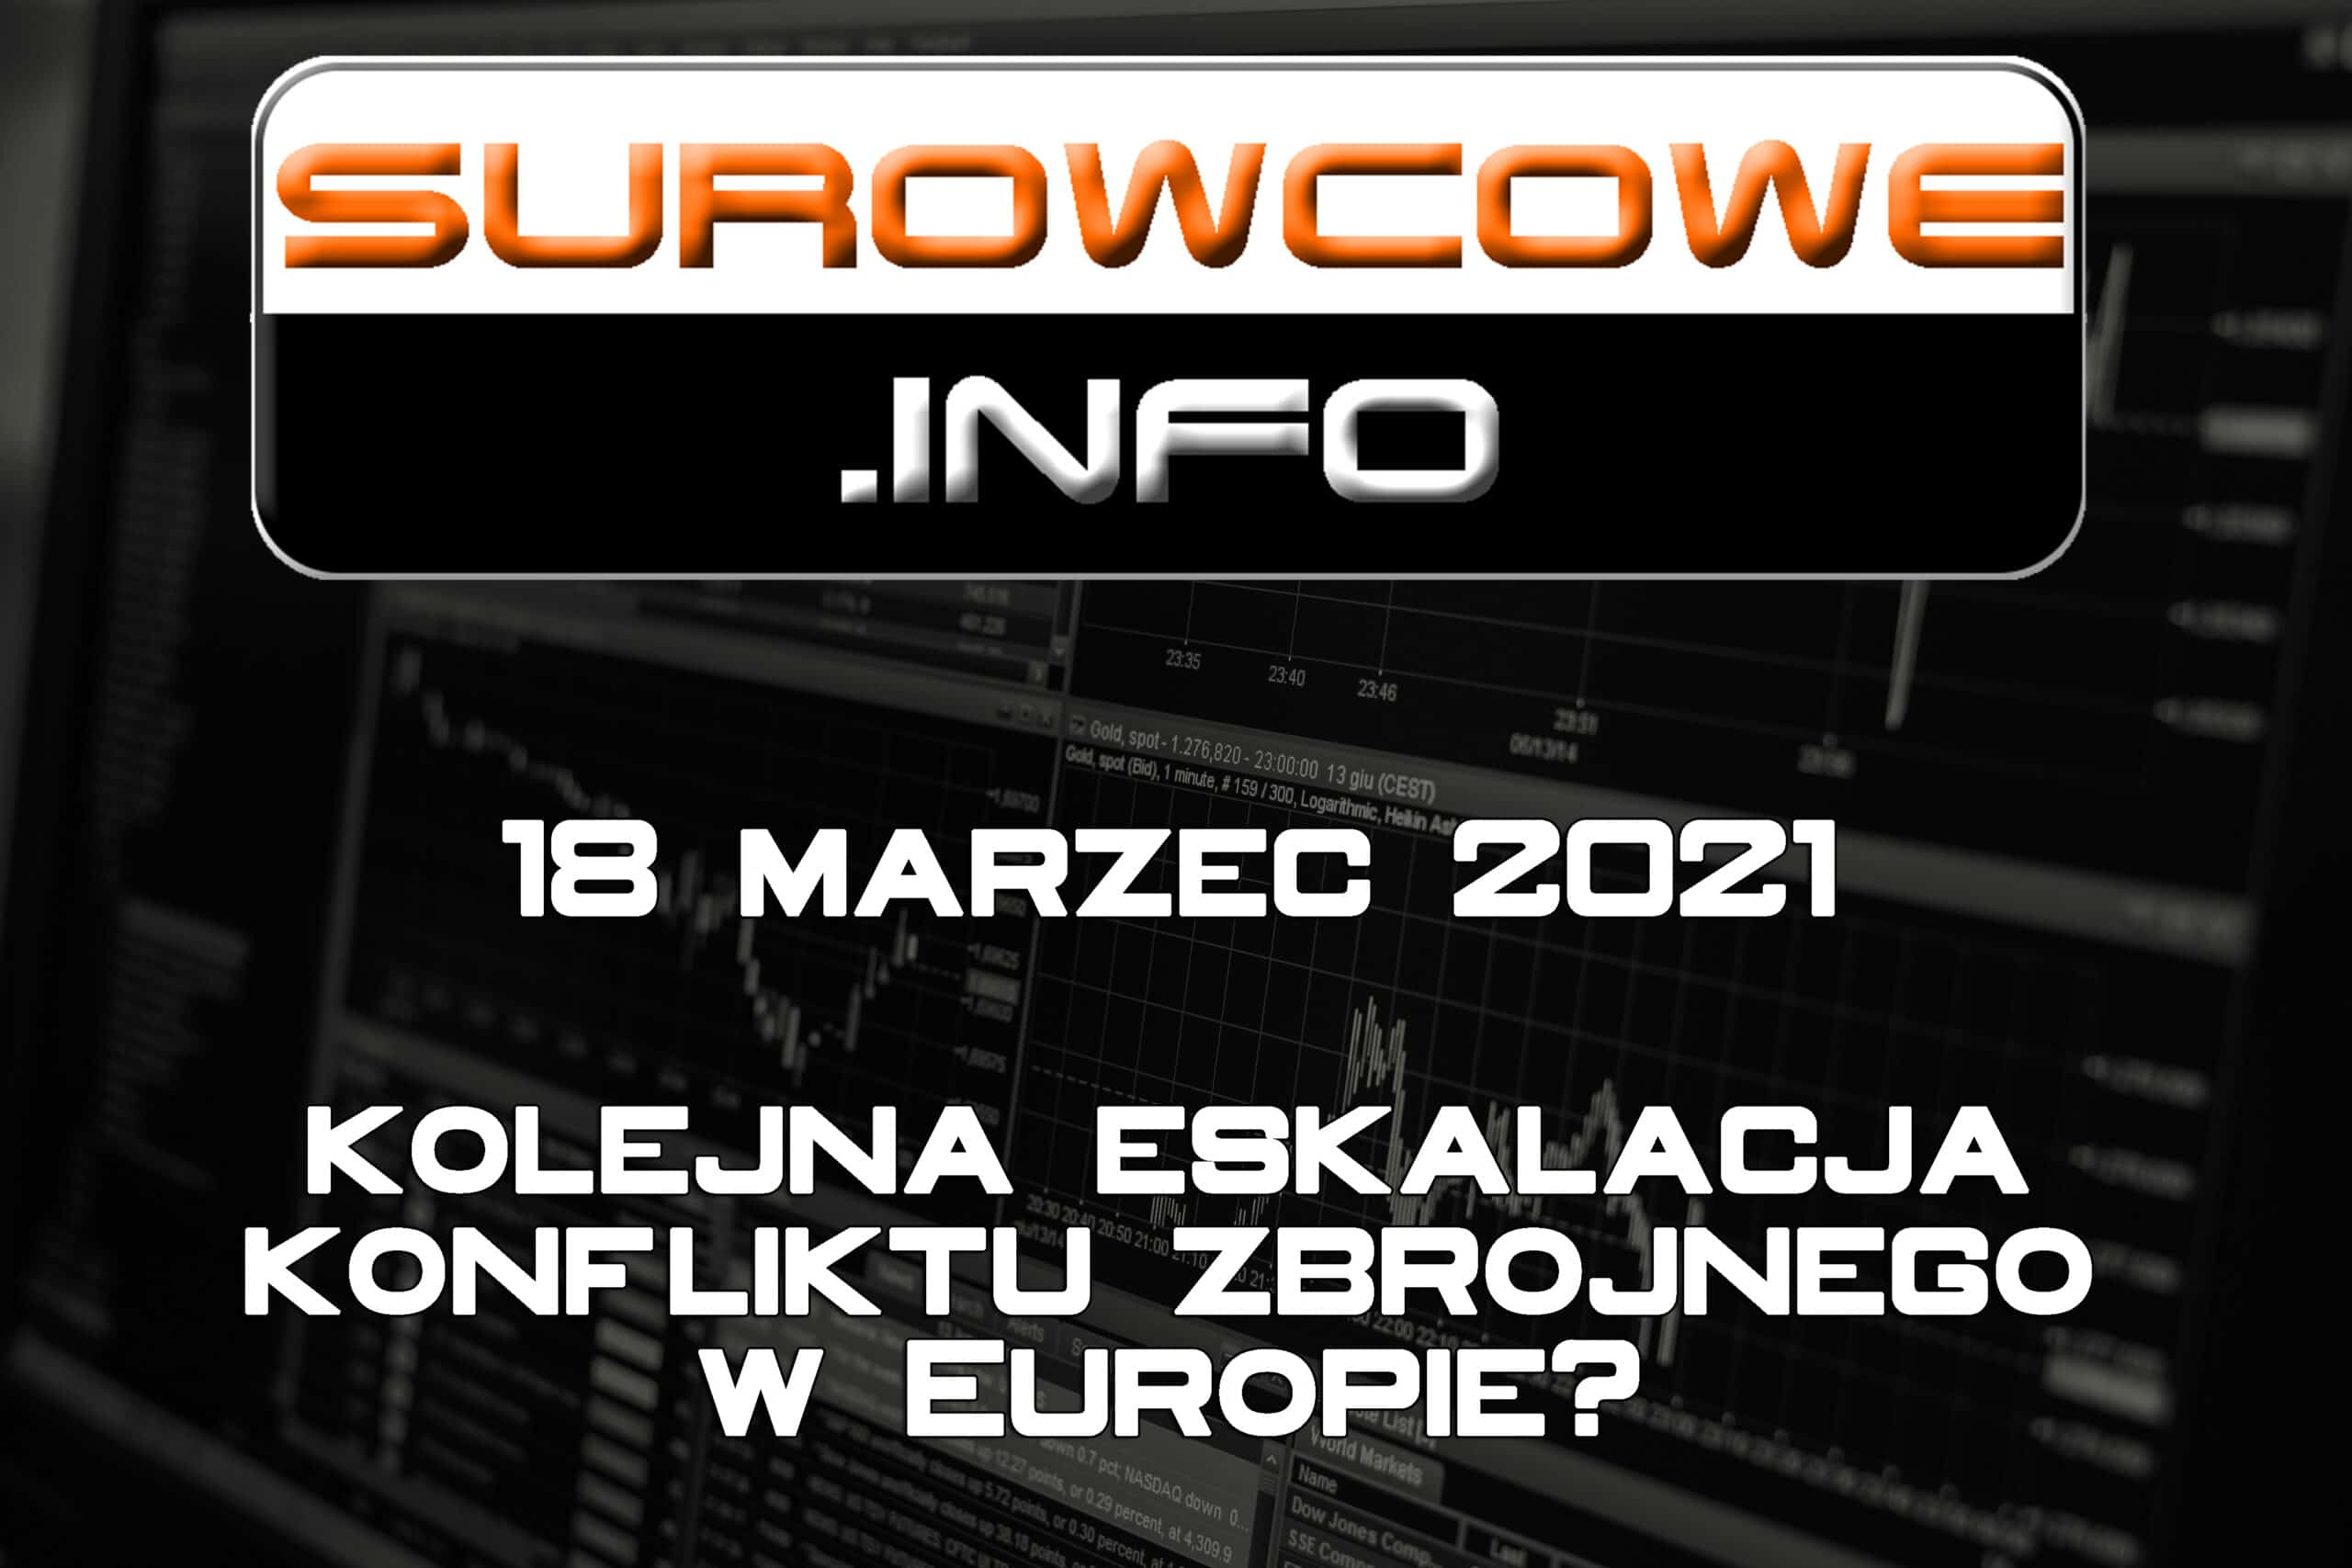 Surowcowe.info 18 marzec 2021